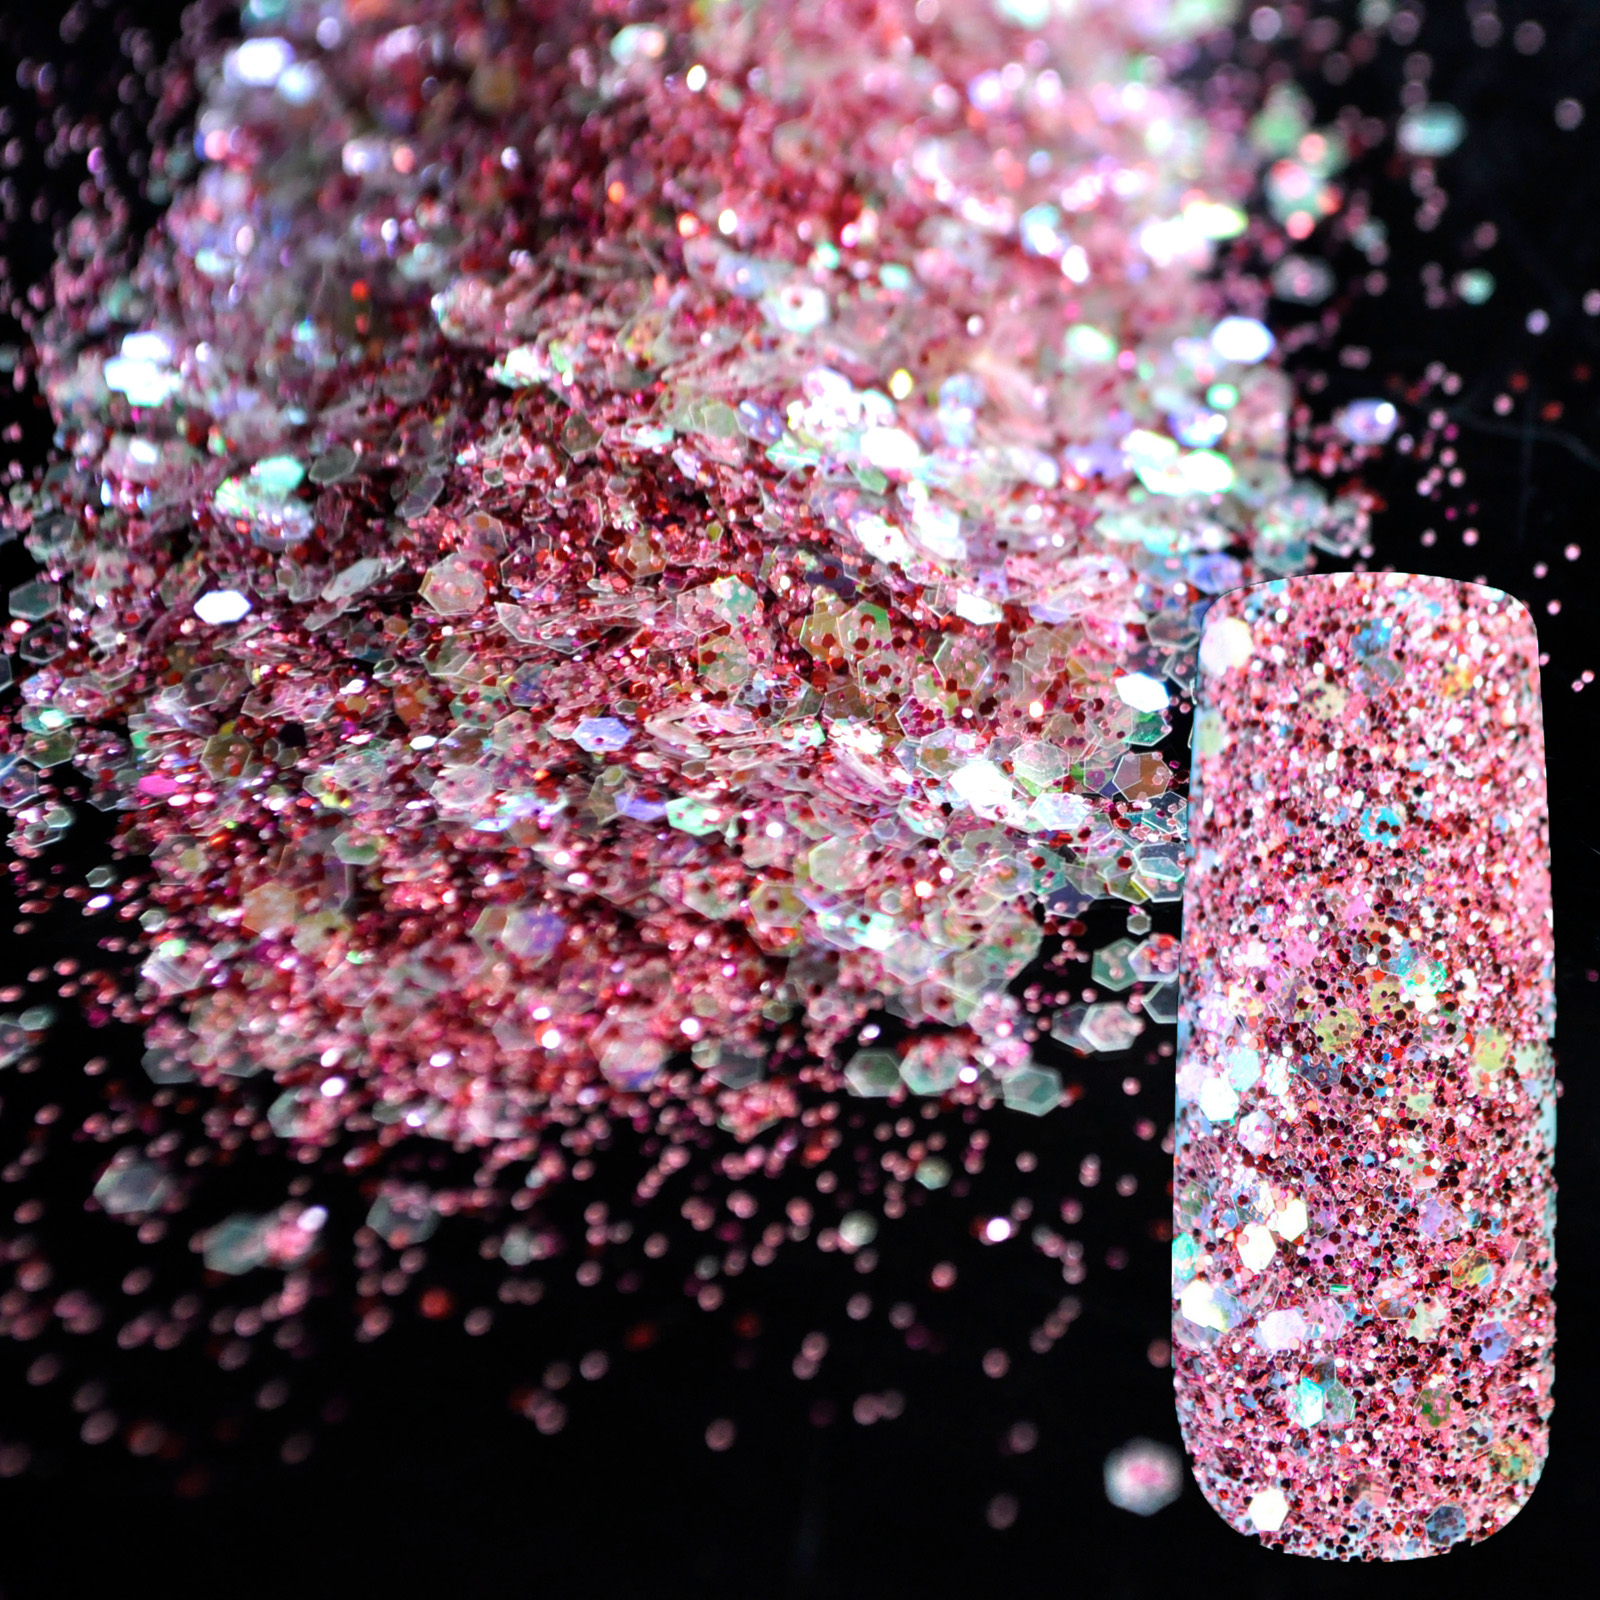 Aliexpress Mix Size Shinning Raibow Pink Red Nail Glitter Powder Diy Art Sequins Decorations Hexagonal Sheet Material 278 From